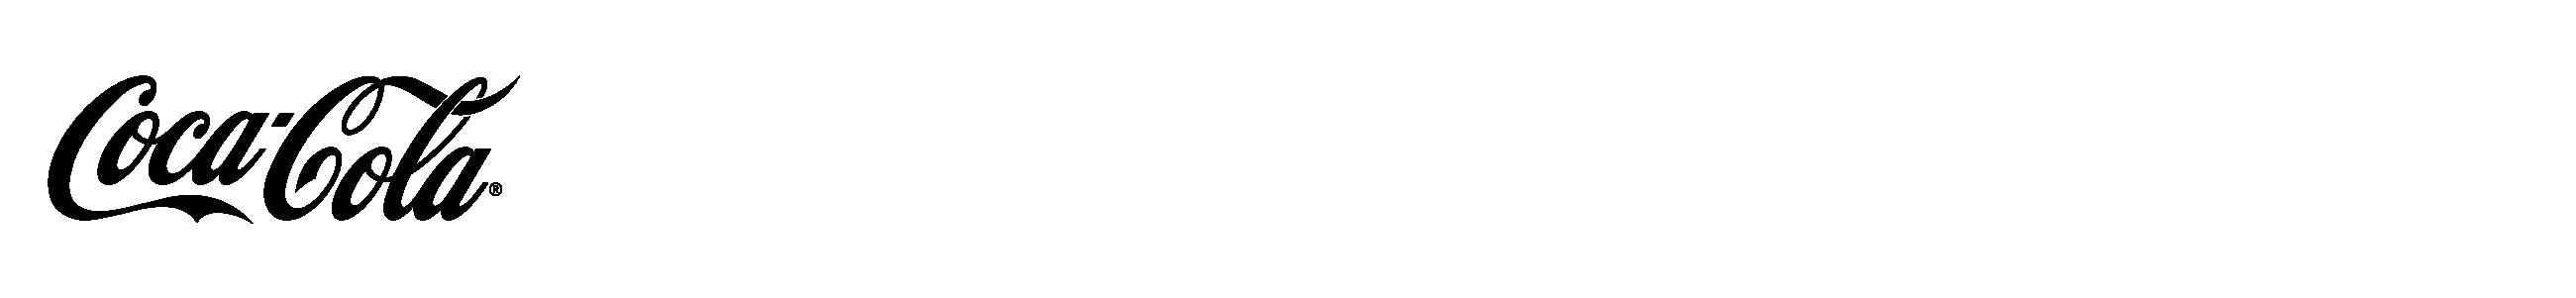 MADHOUSE_-_WEB_V2_COCACOLA_-_CLIENTES